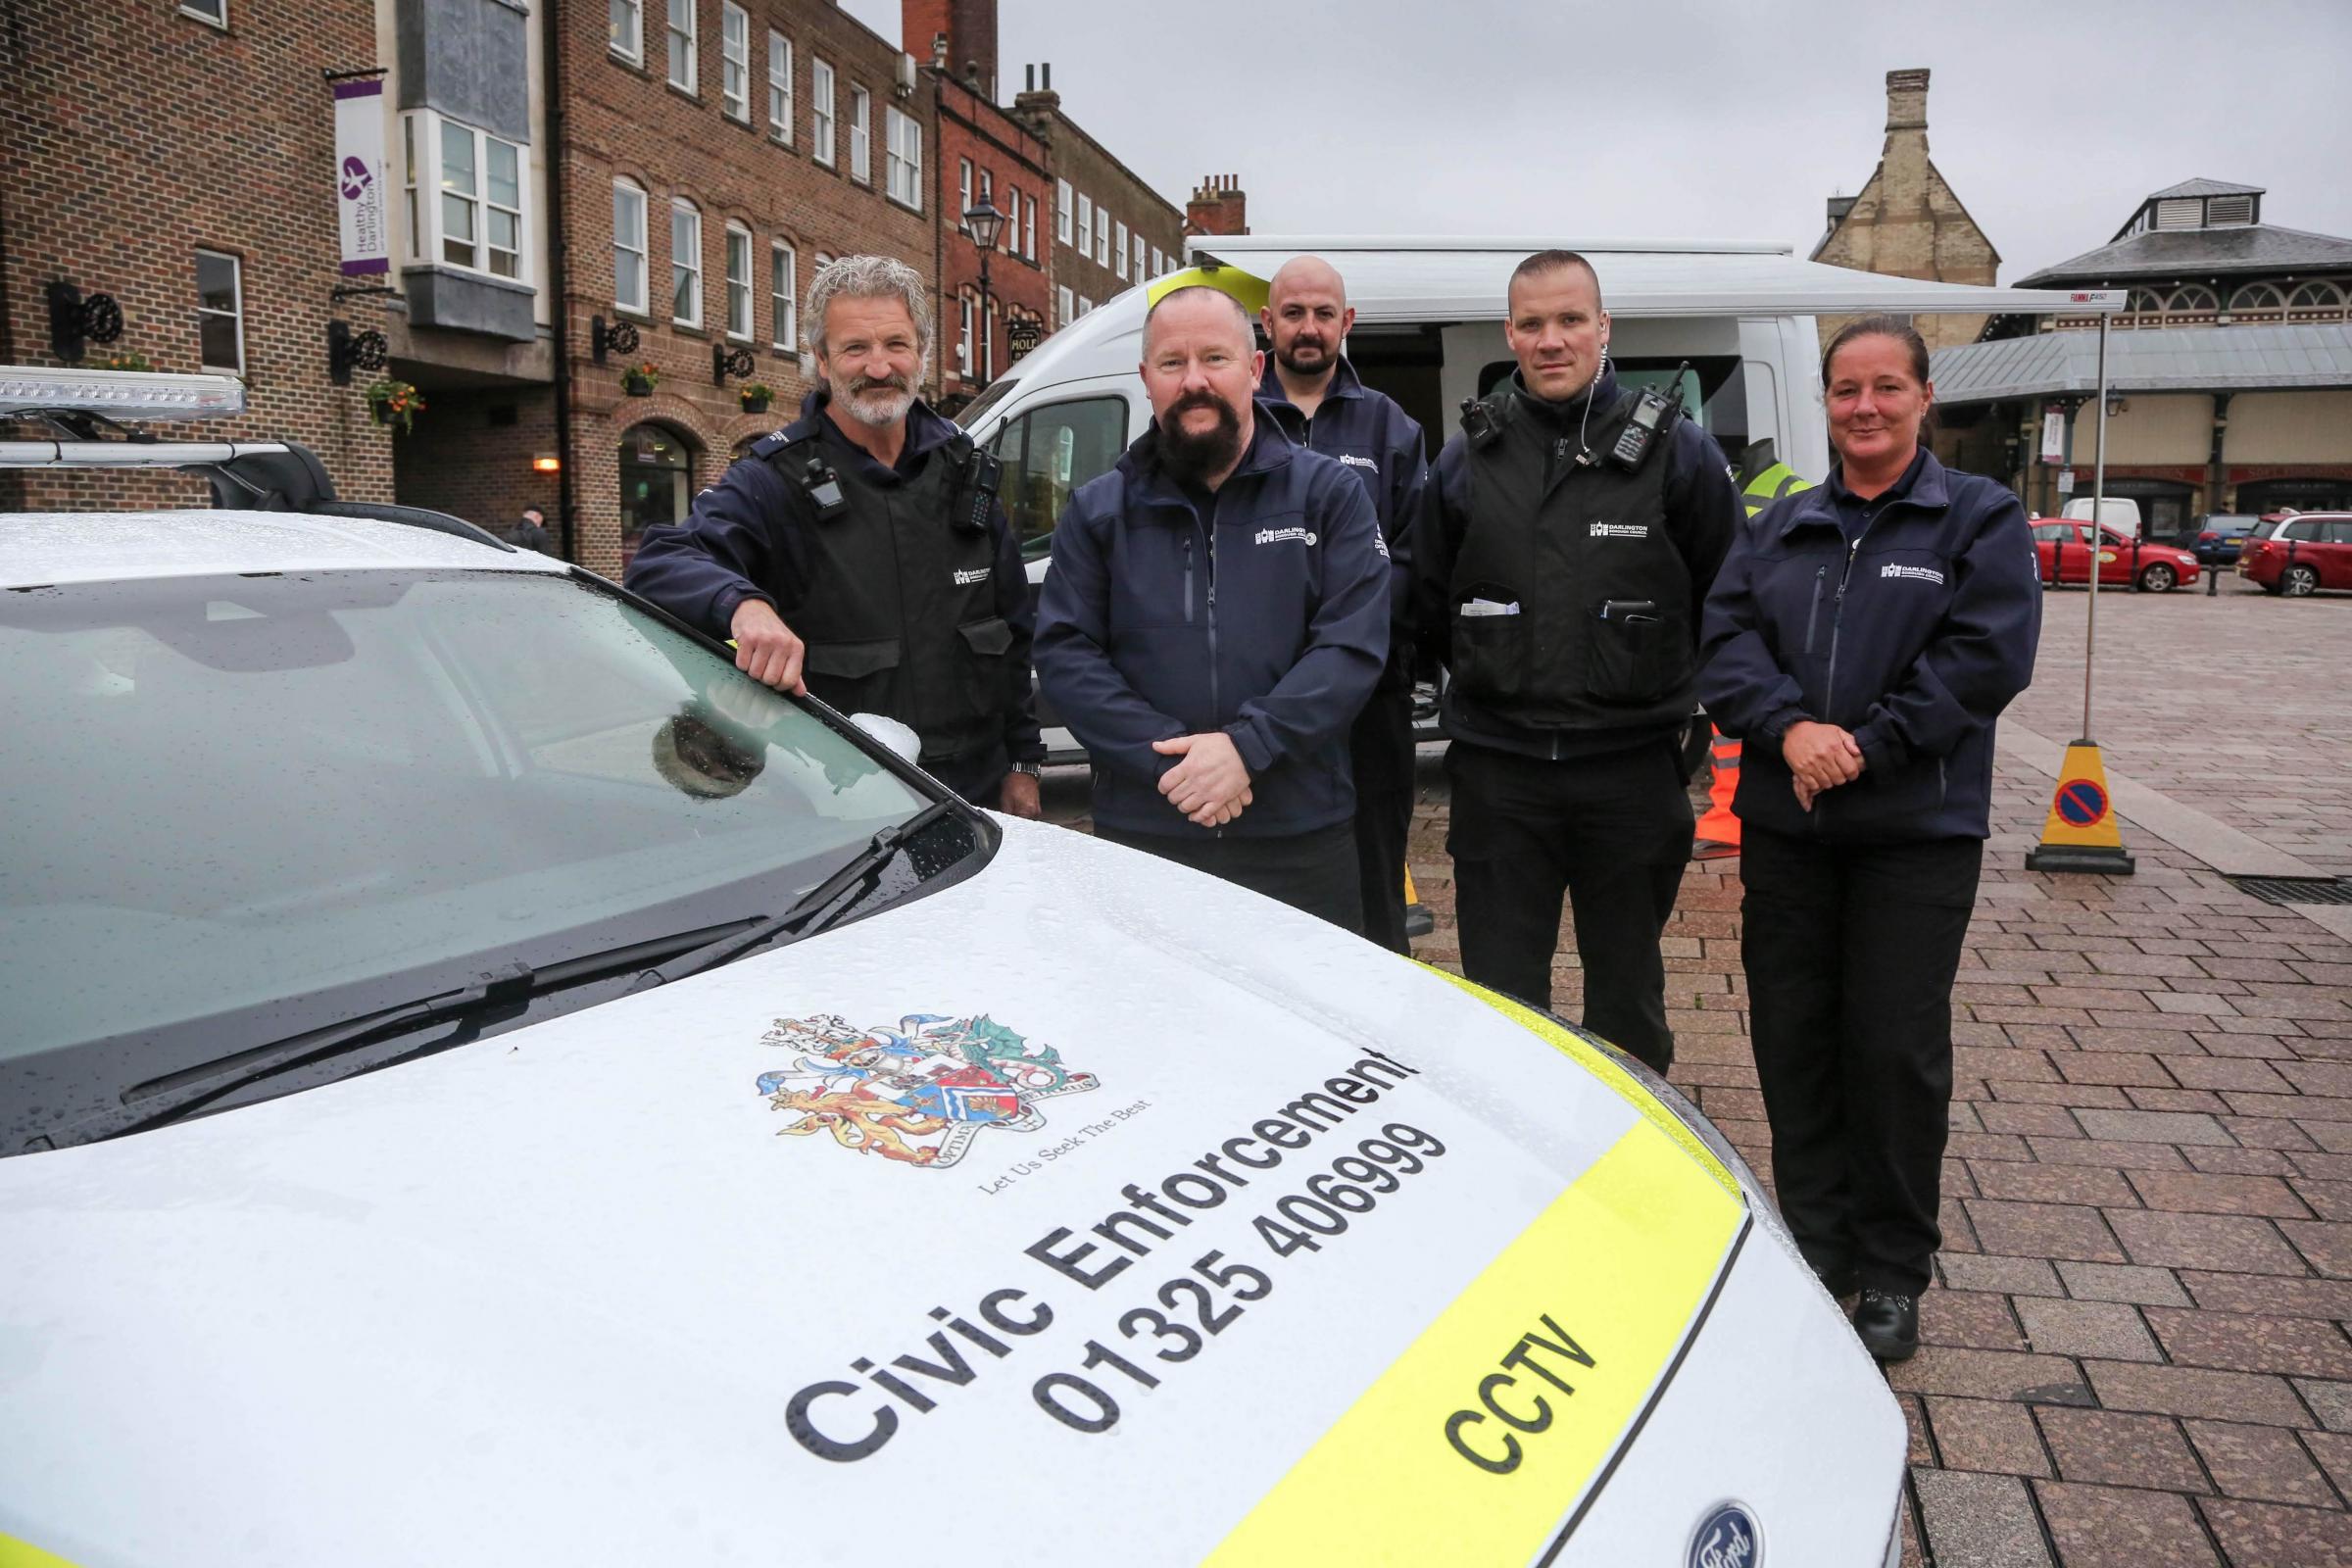 Darlington Community Safety Team to tackle anti-social behaviour